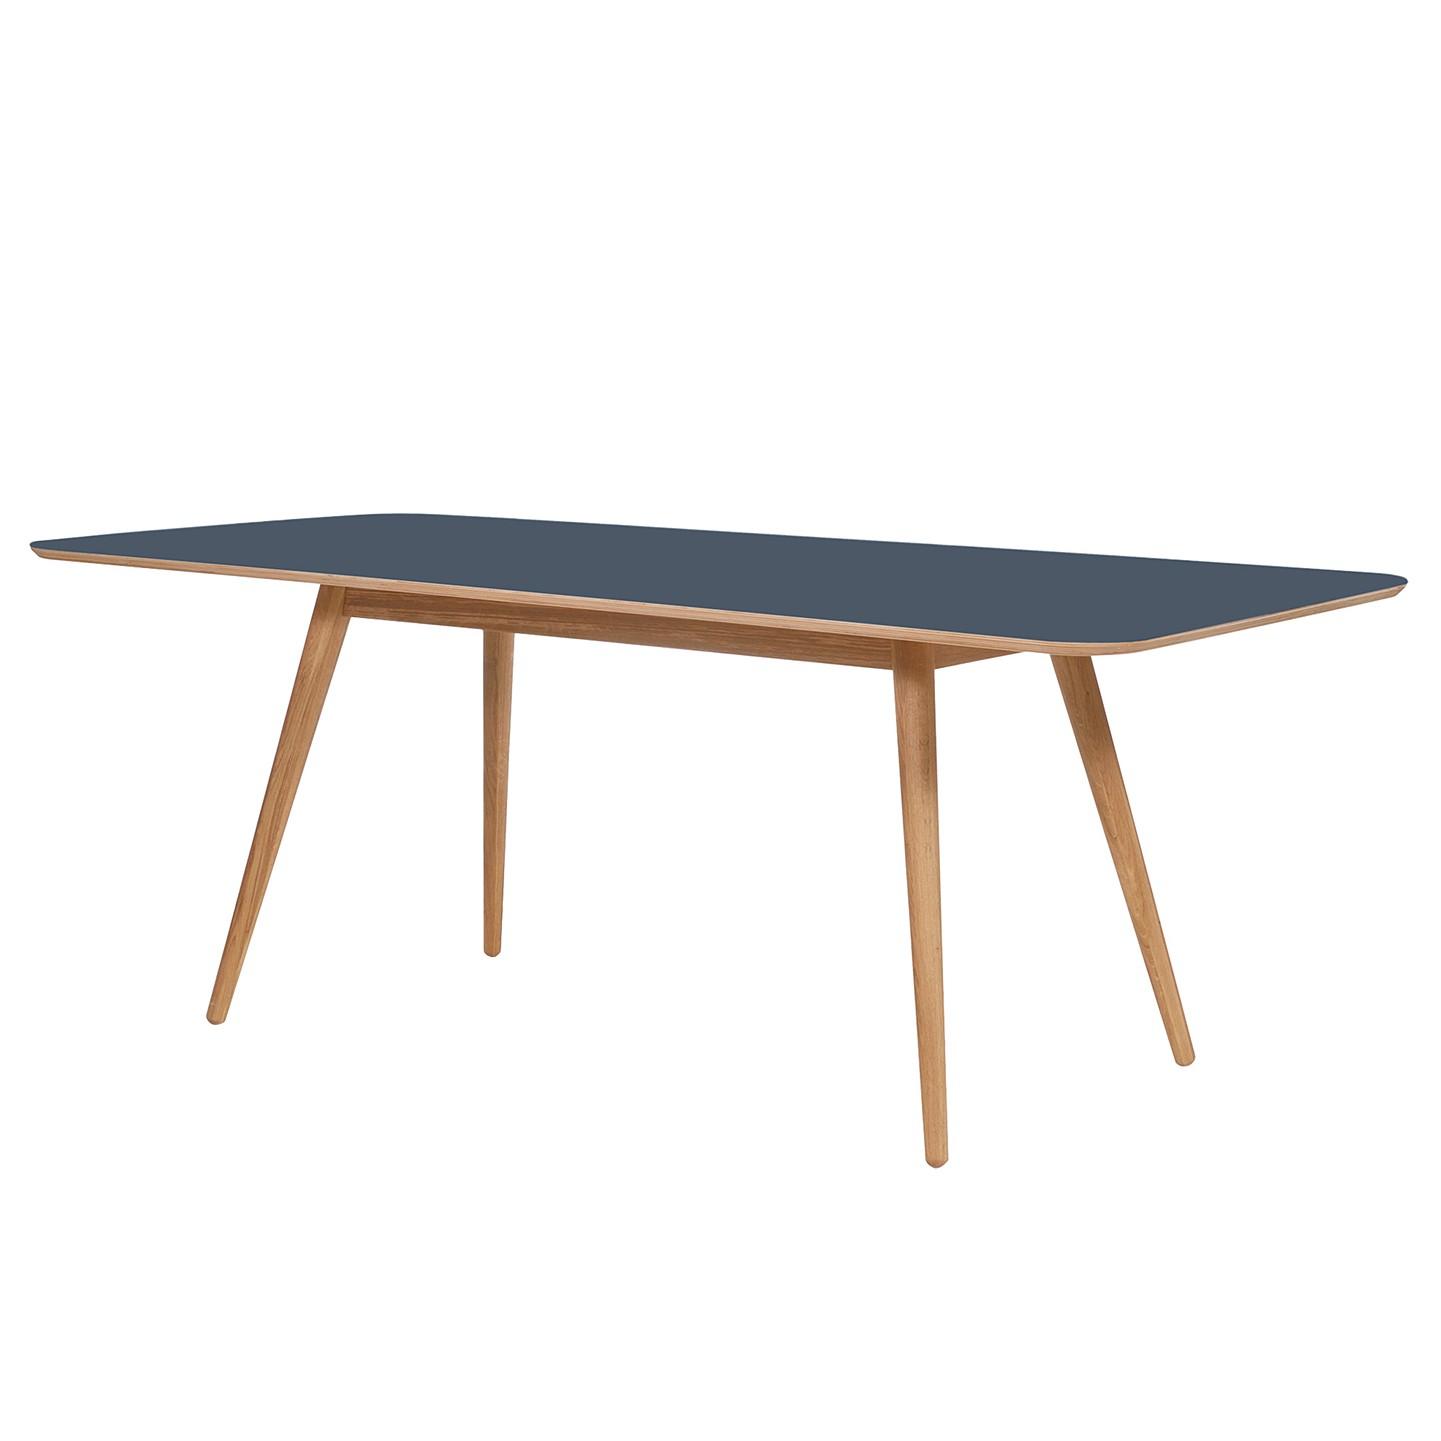 Eettafel Viggo - deels massief eikenhout/linoleum - Petrolblauw/eikenhout - 160x90cm, Studio Copenhagen